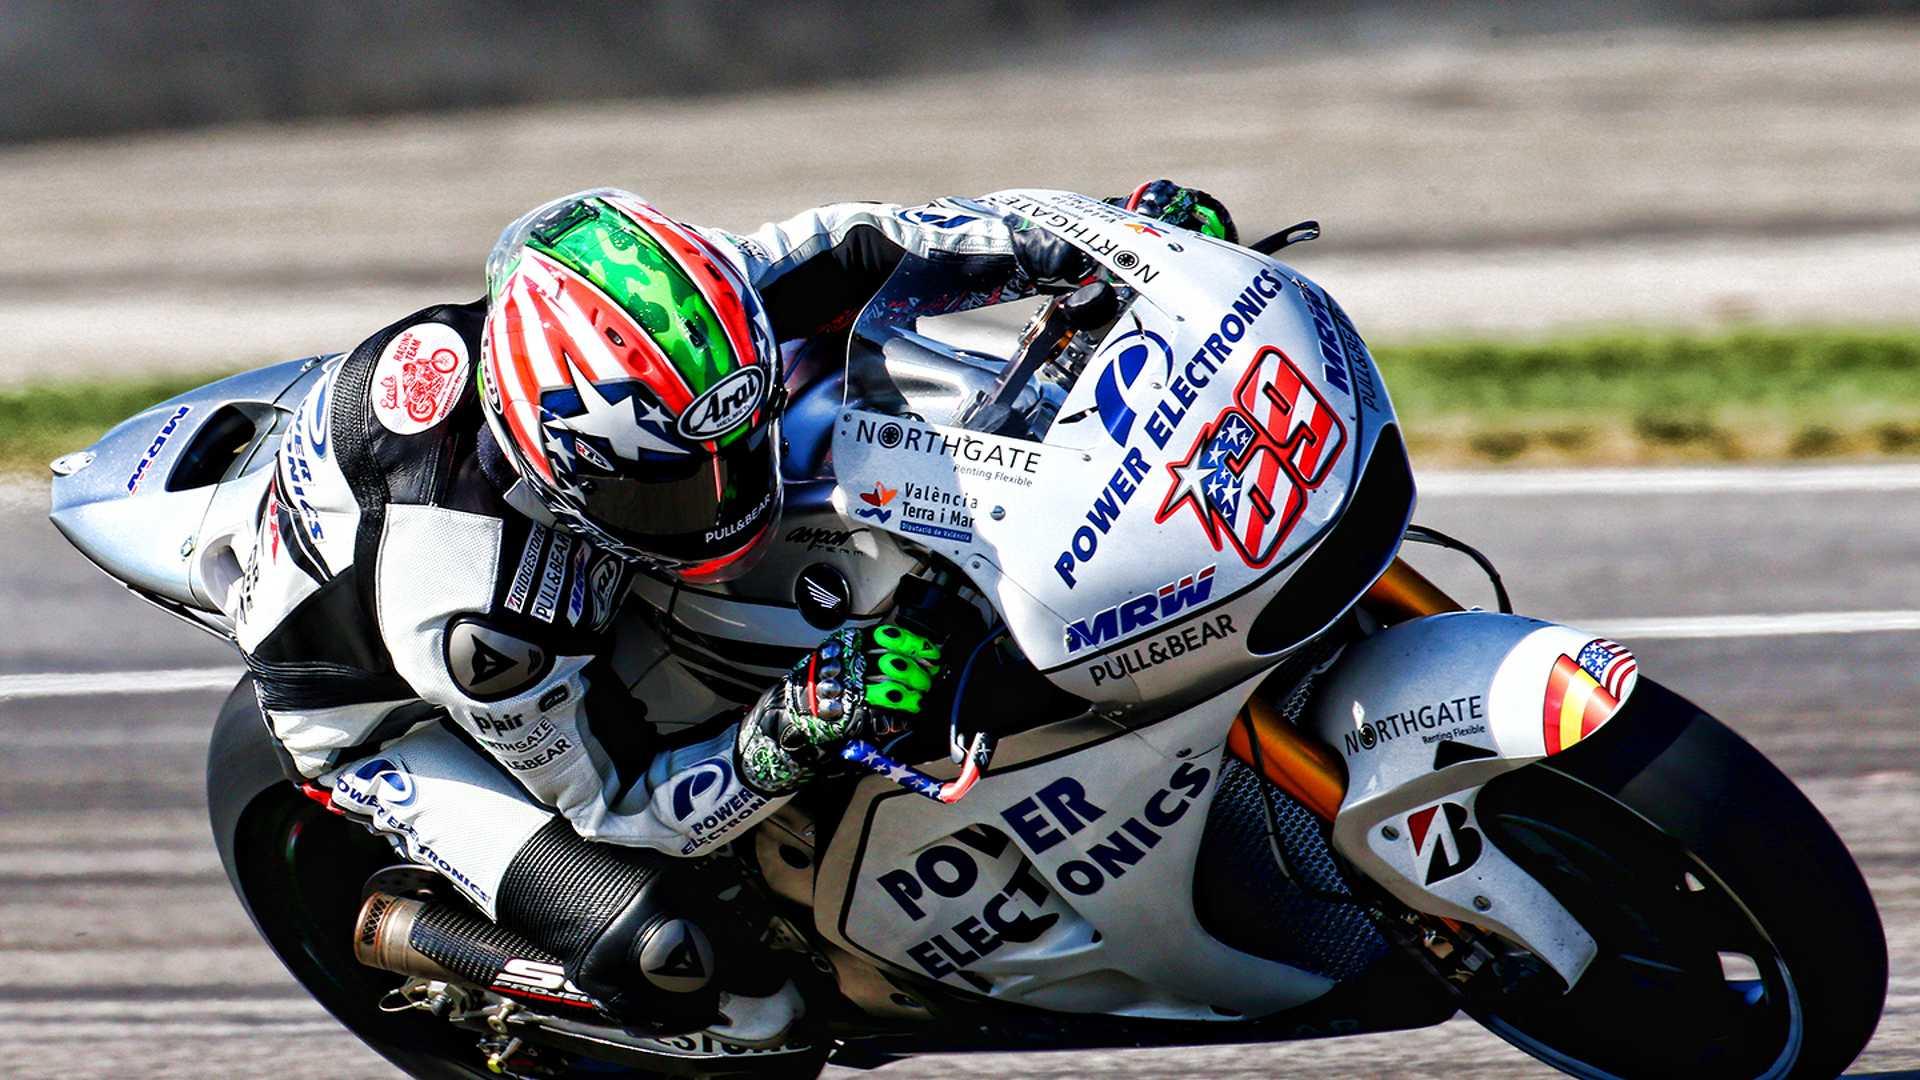 2015 Nicky Hayden Power Electronics Aspar Honda Motogp Insideevs Photos